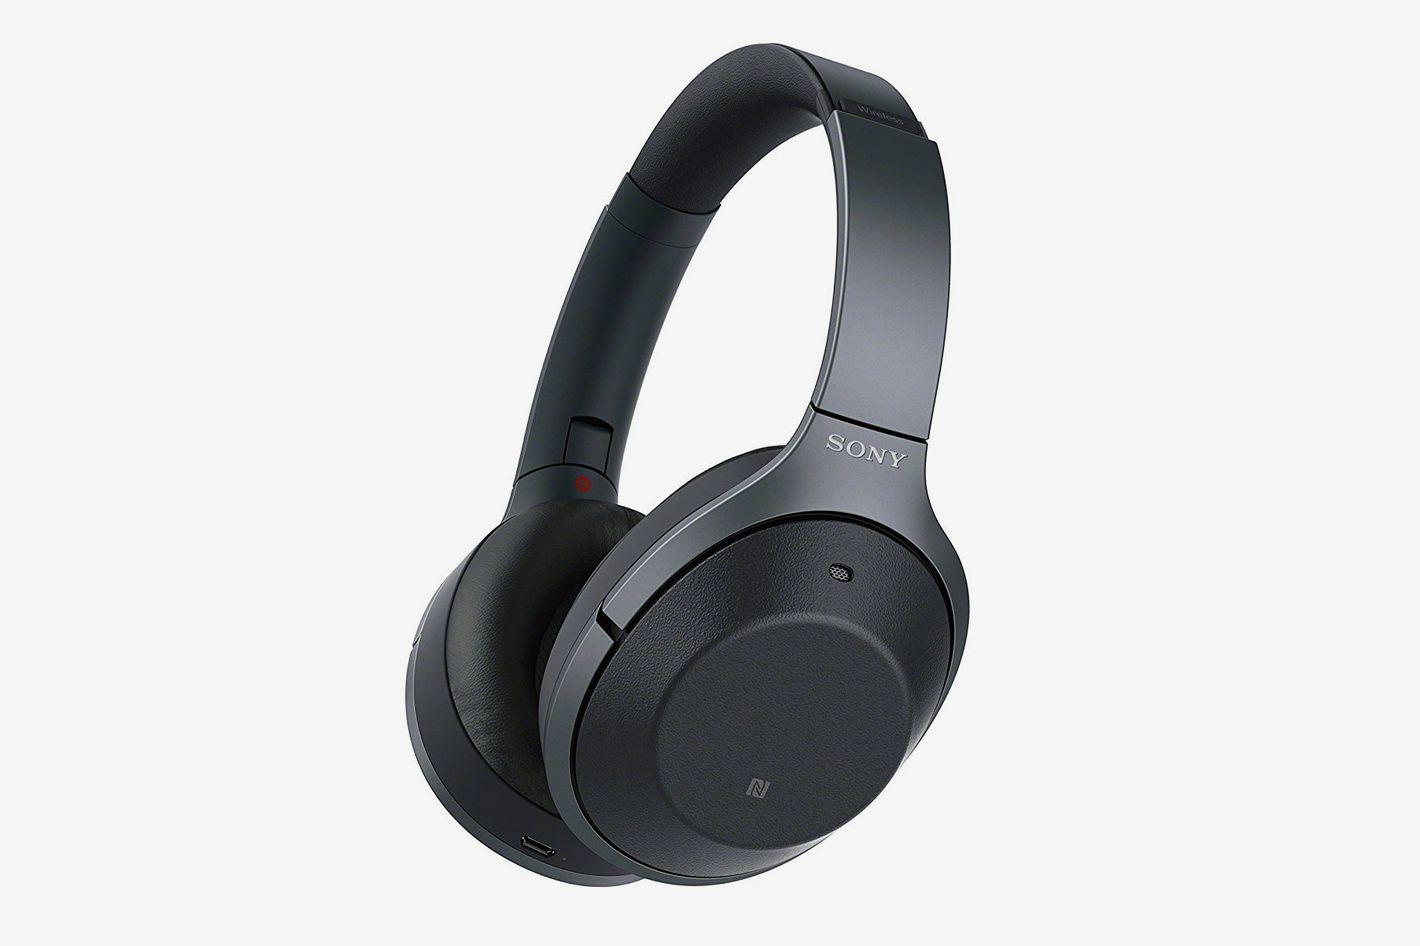 Sony Noise Cancelling Headphones WH1000XM2